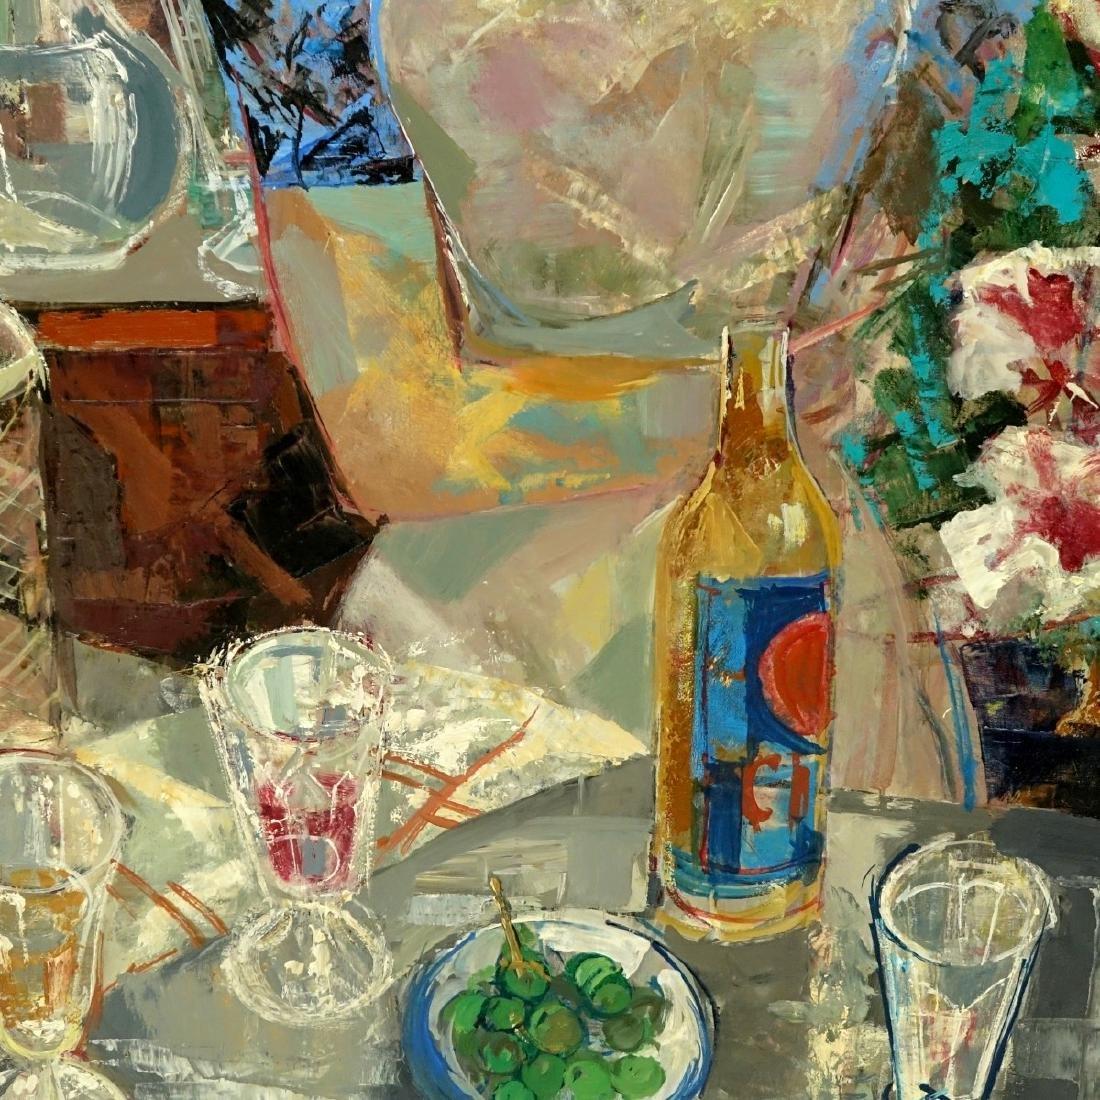 Emilio Grau-Sala, Spanish  (1911 - 1975) Oil - 5